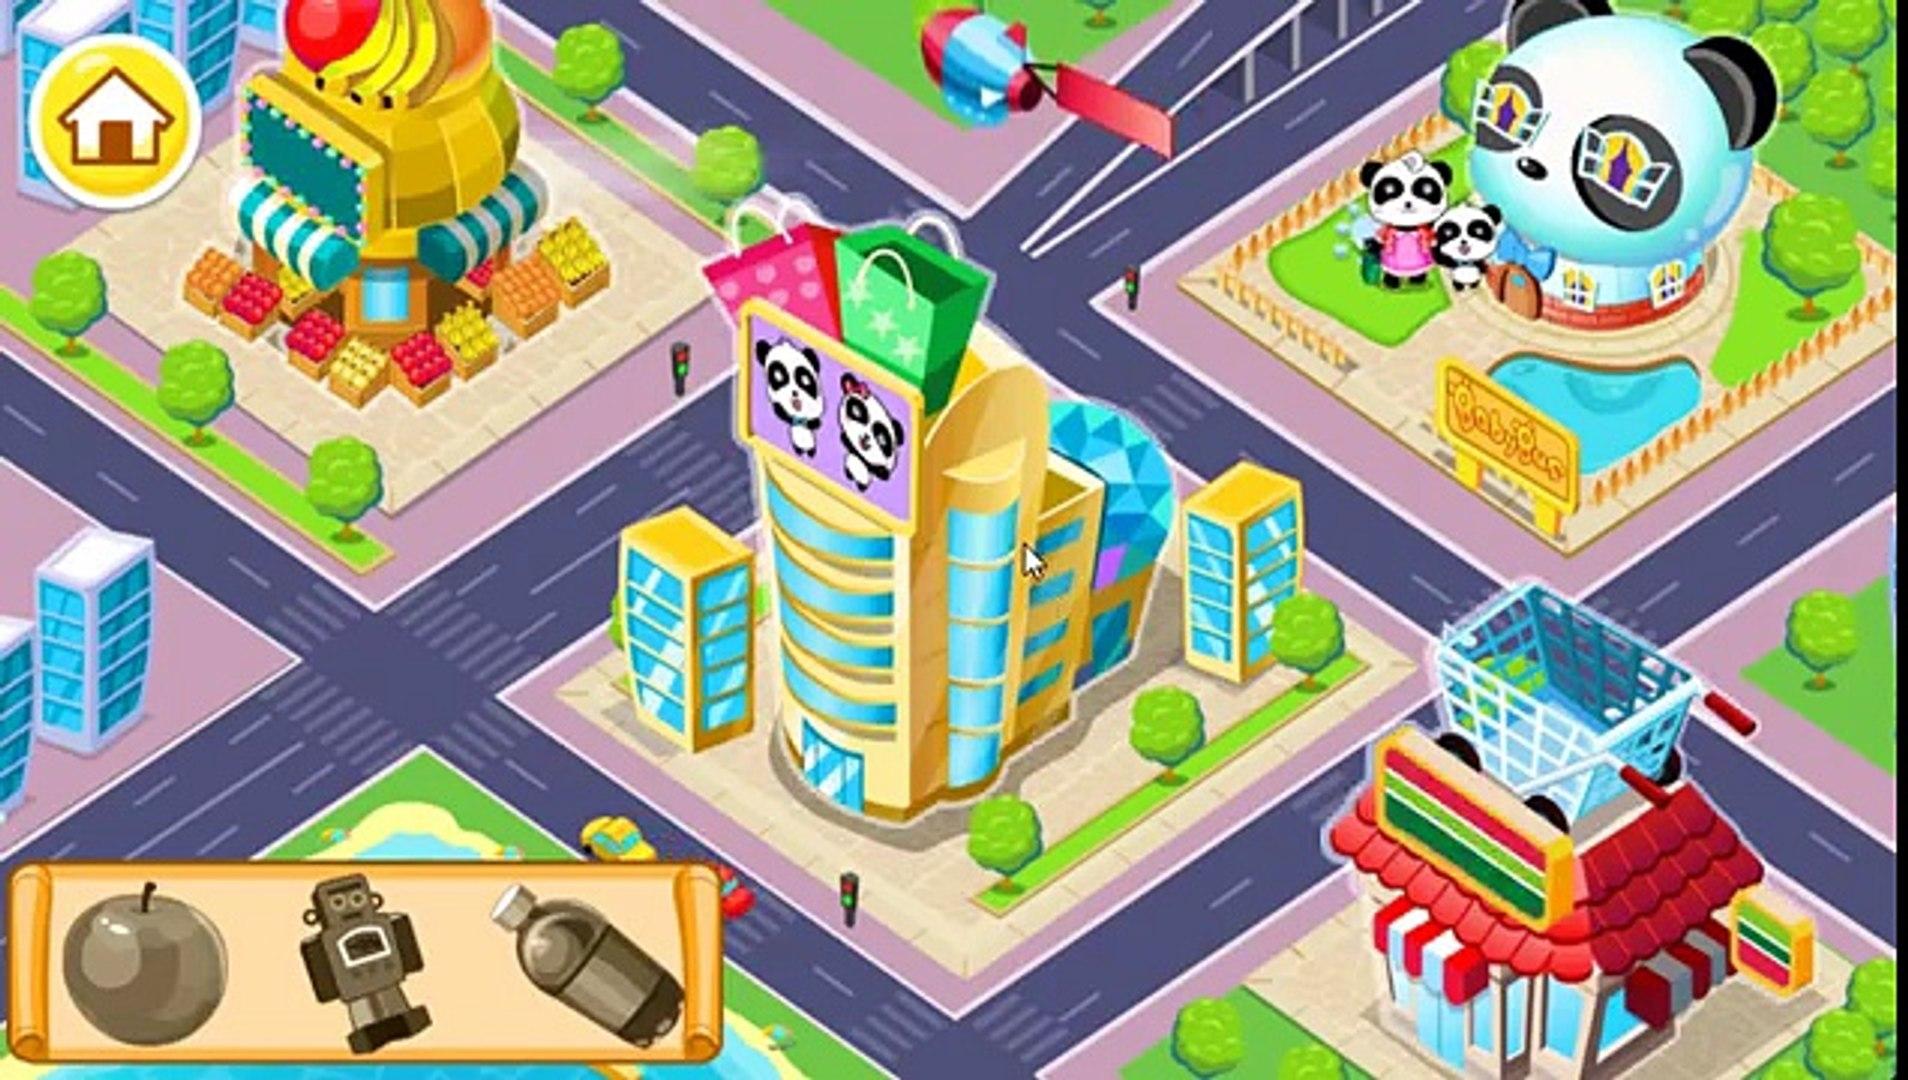 Travel Safety Tips ─ Kids Games ─ Education Panda ─ Babybus